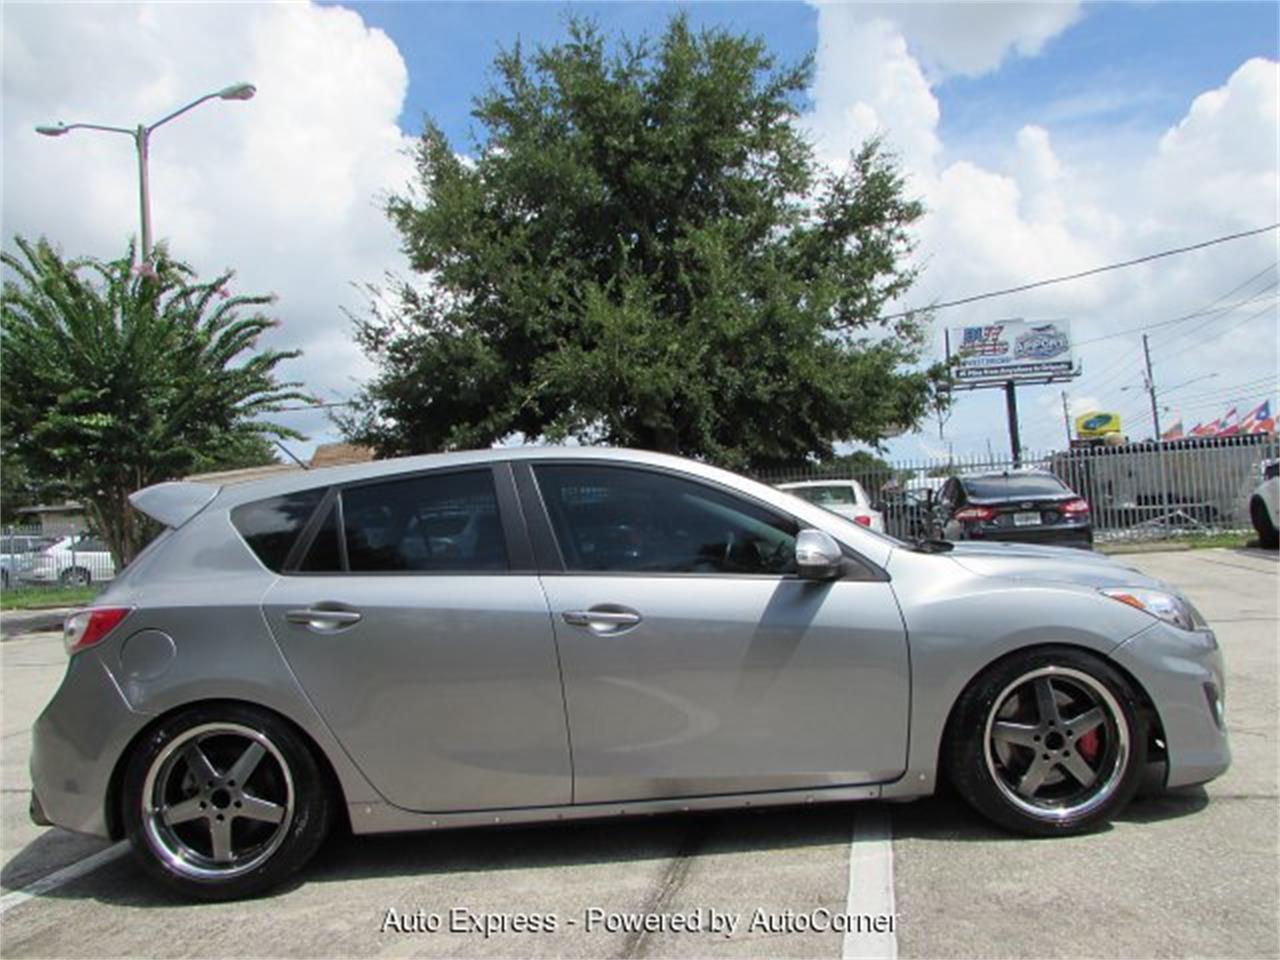 Mazdaspeed3 For Sale >> 2012 Mazda Mazdaspeed3 For Sale In Orlando Fl